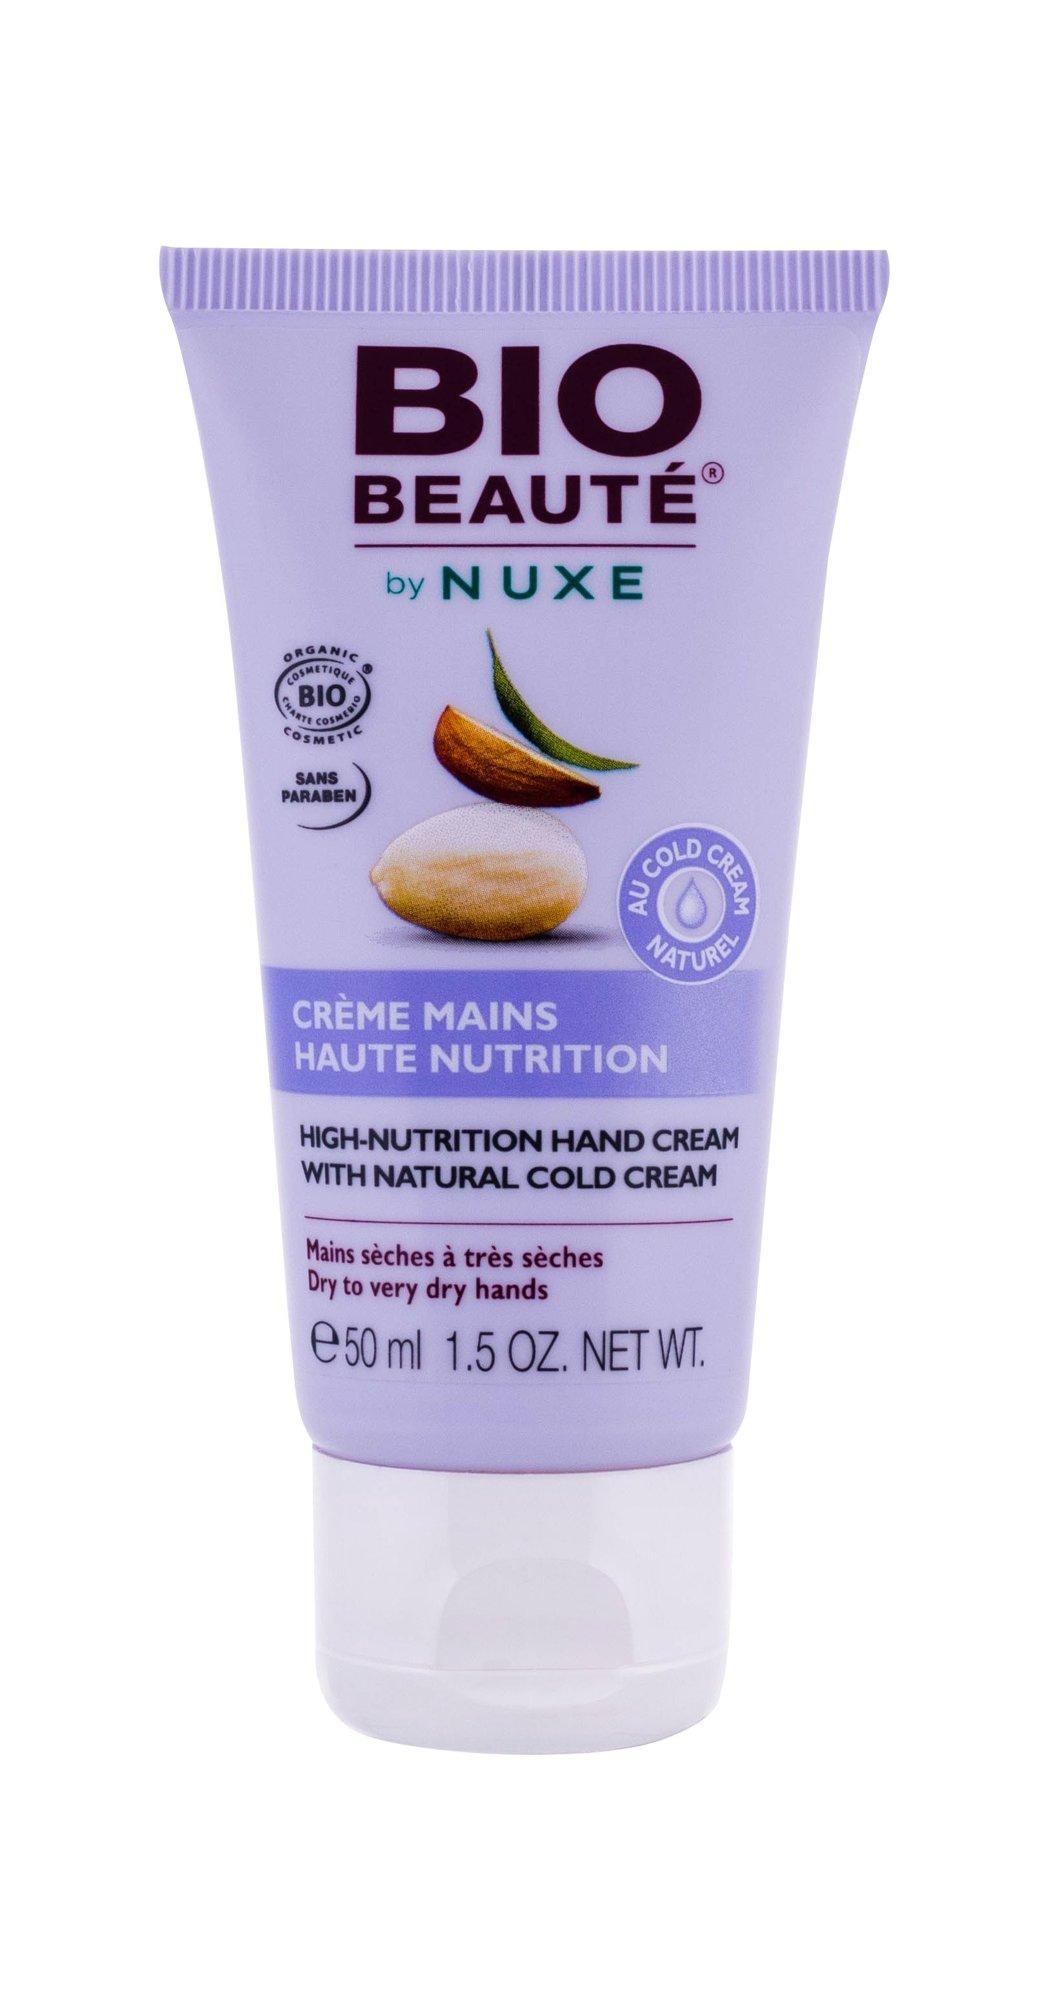 NUXE BIO BEAUTÉ Hand Cream 50ml  High-Nutrition Hand Cream